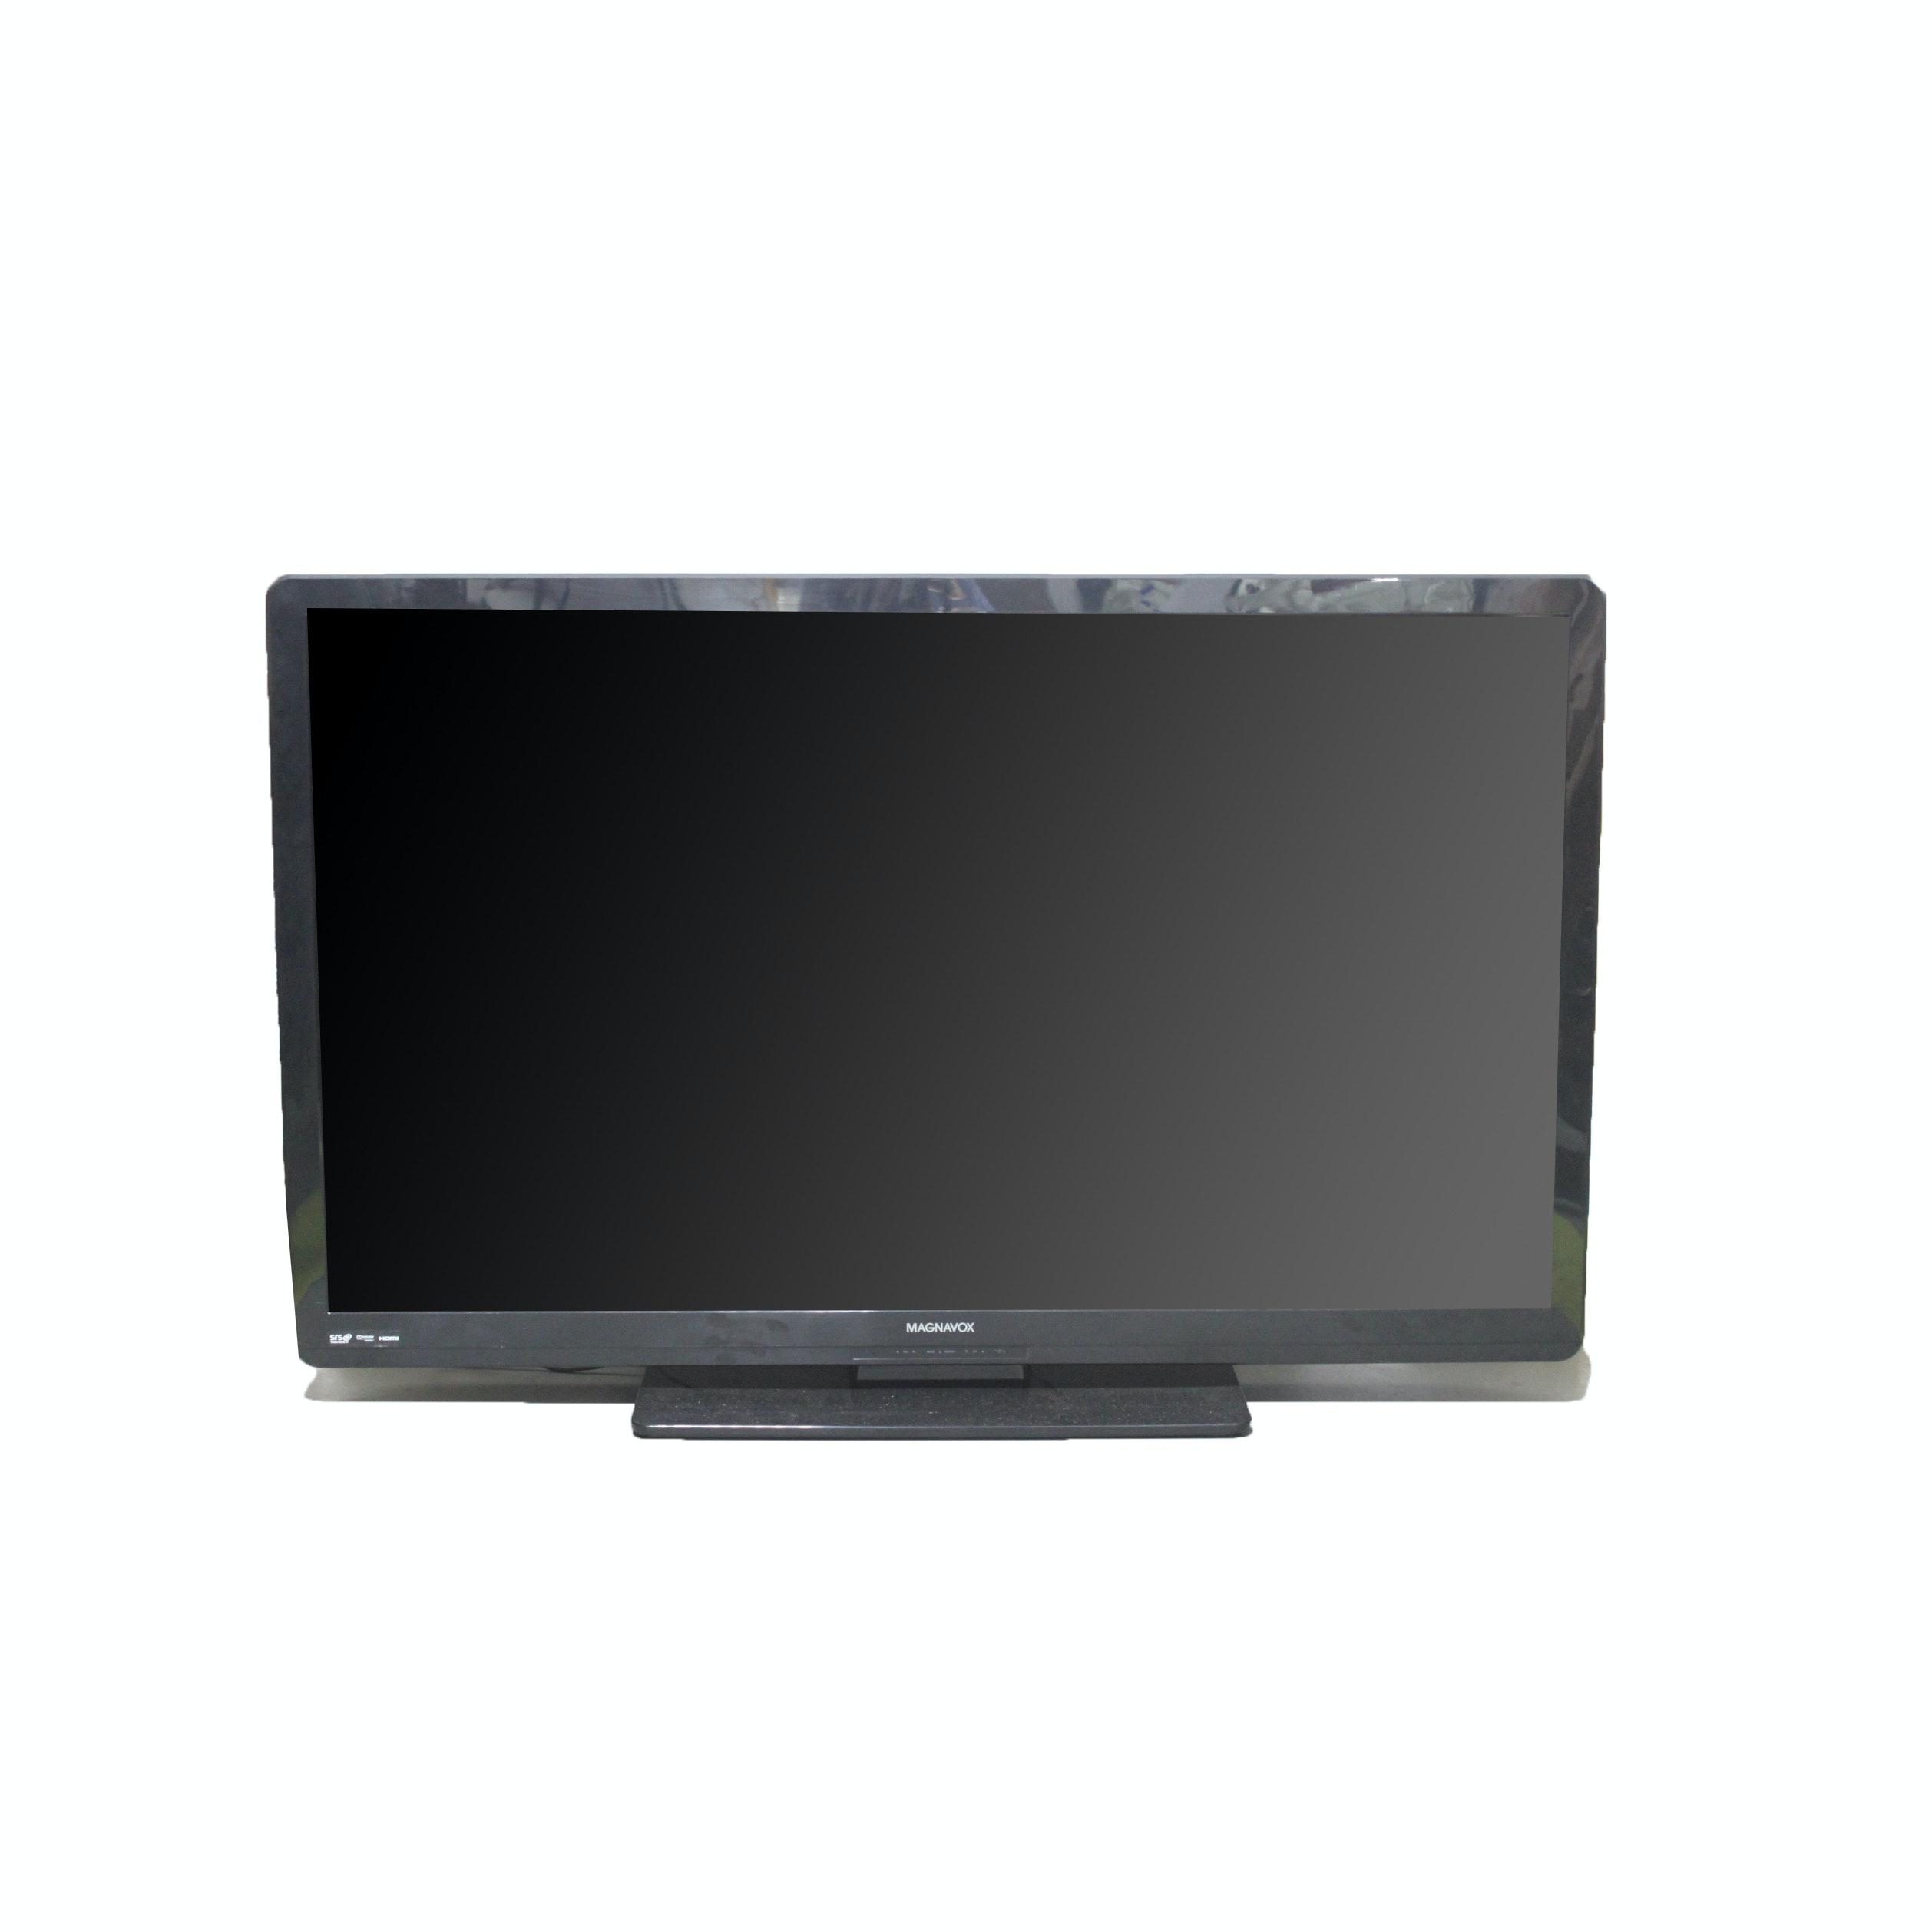 "50"" Magnavox Television"